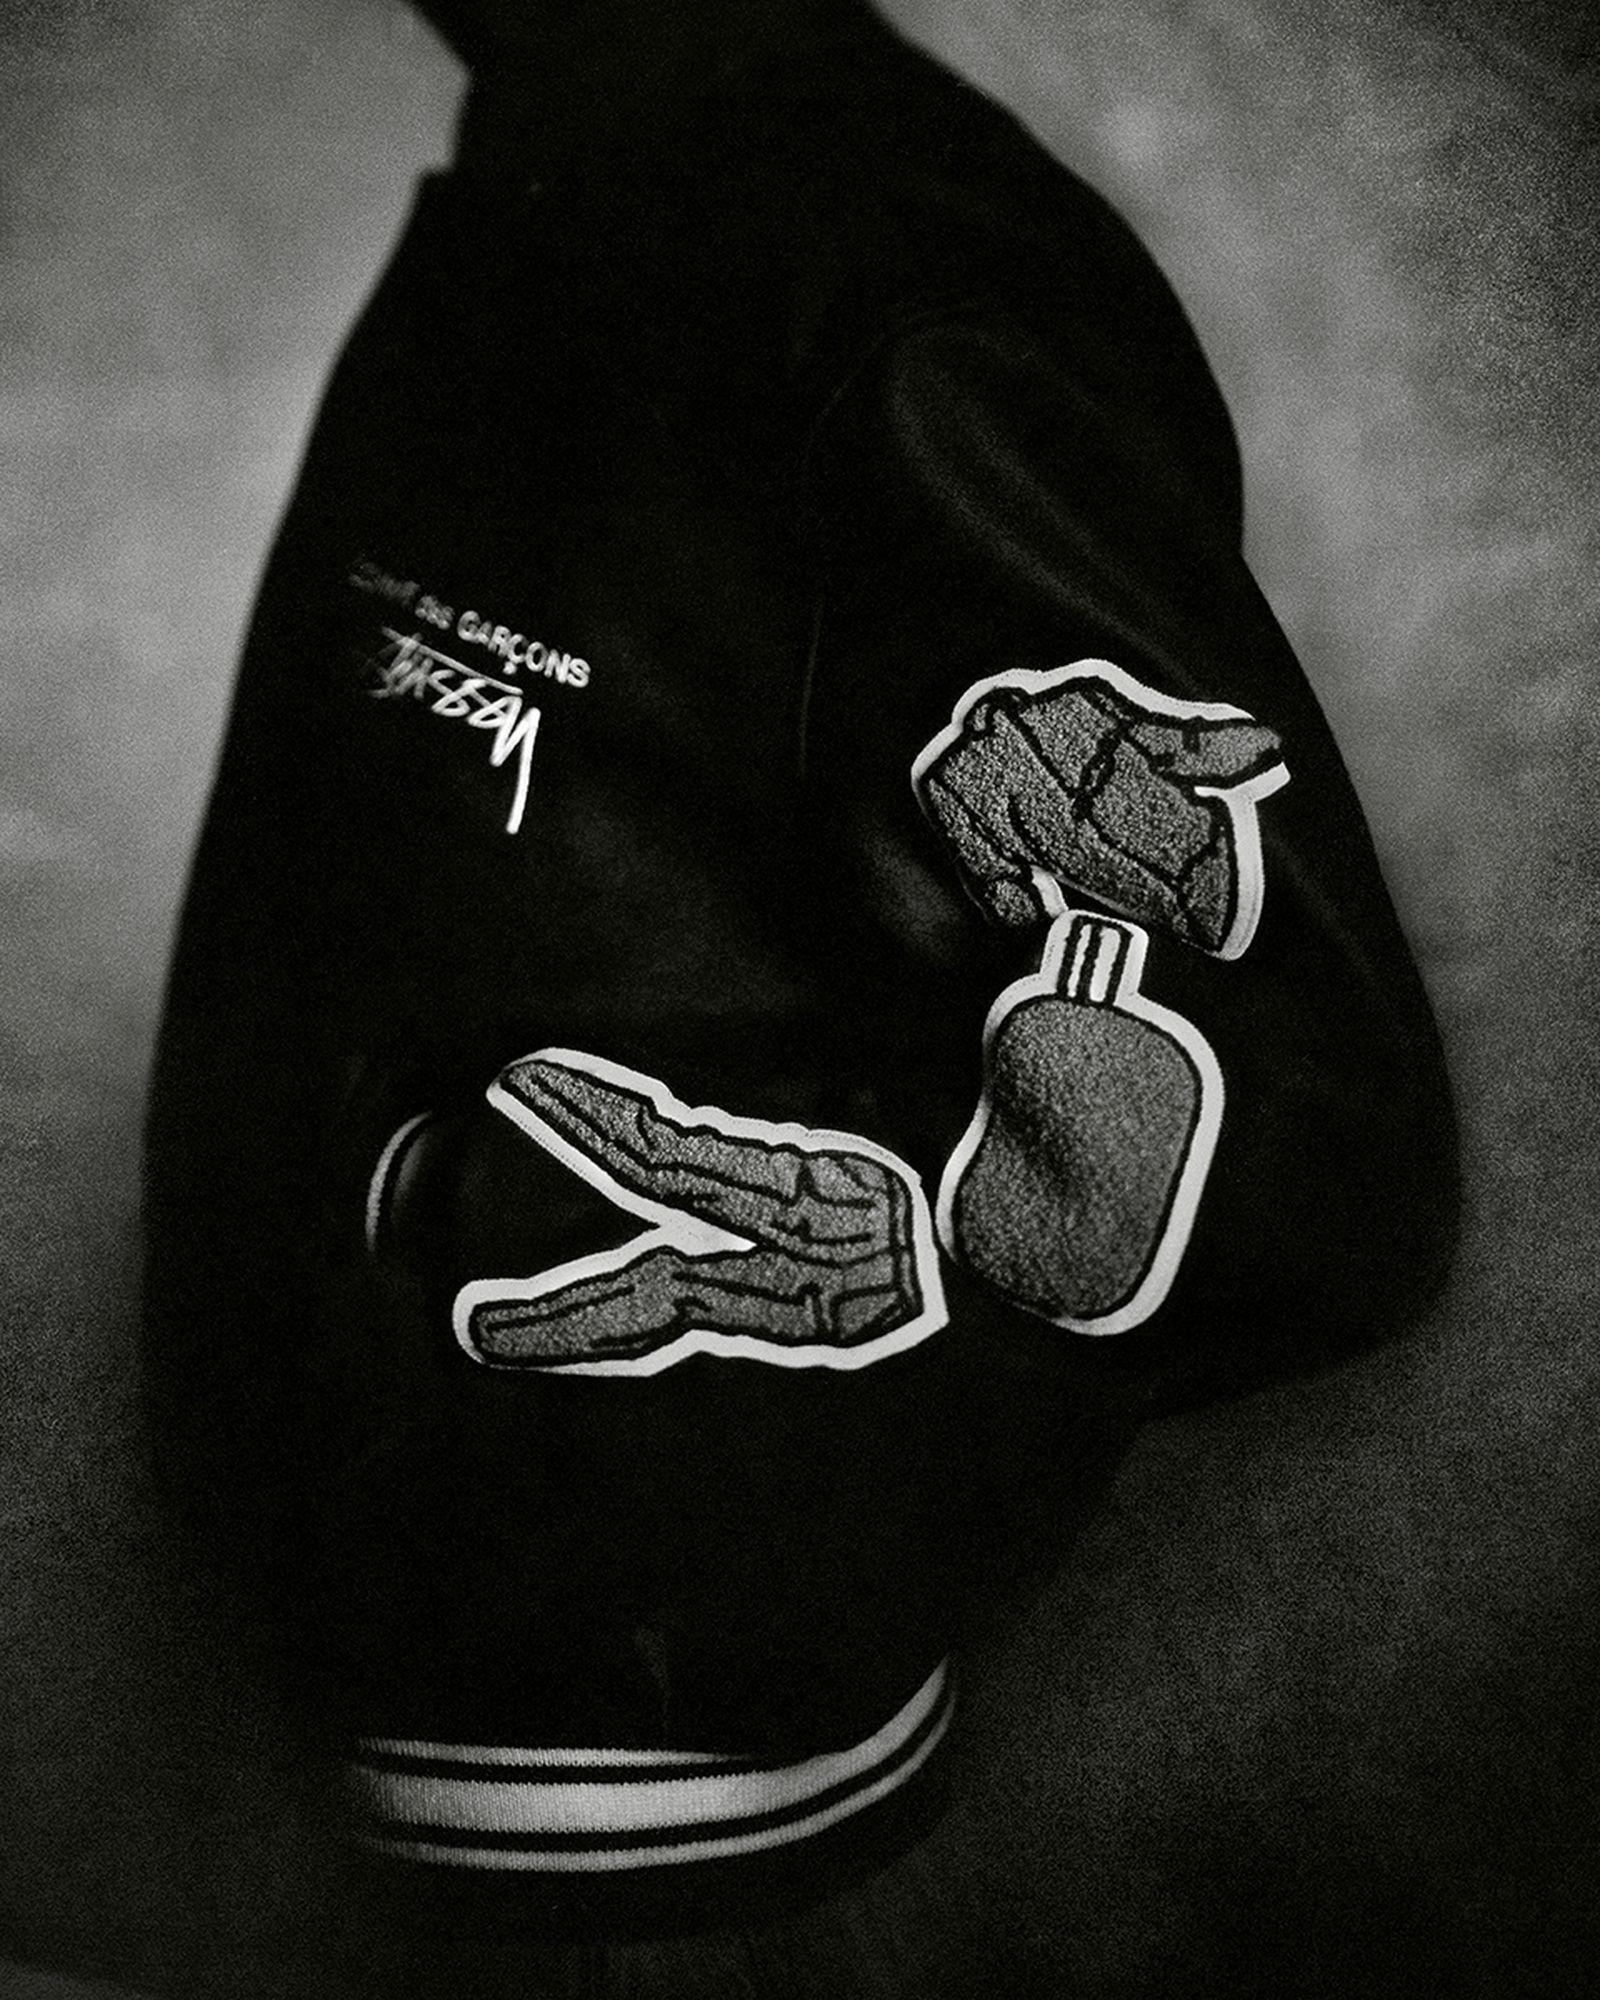 stussy-comme-des-garcons-varsity-jacket-05